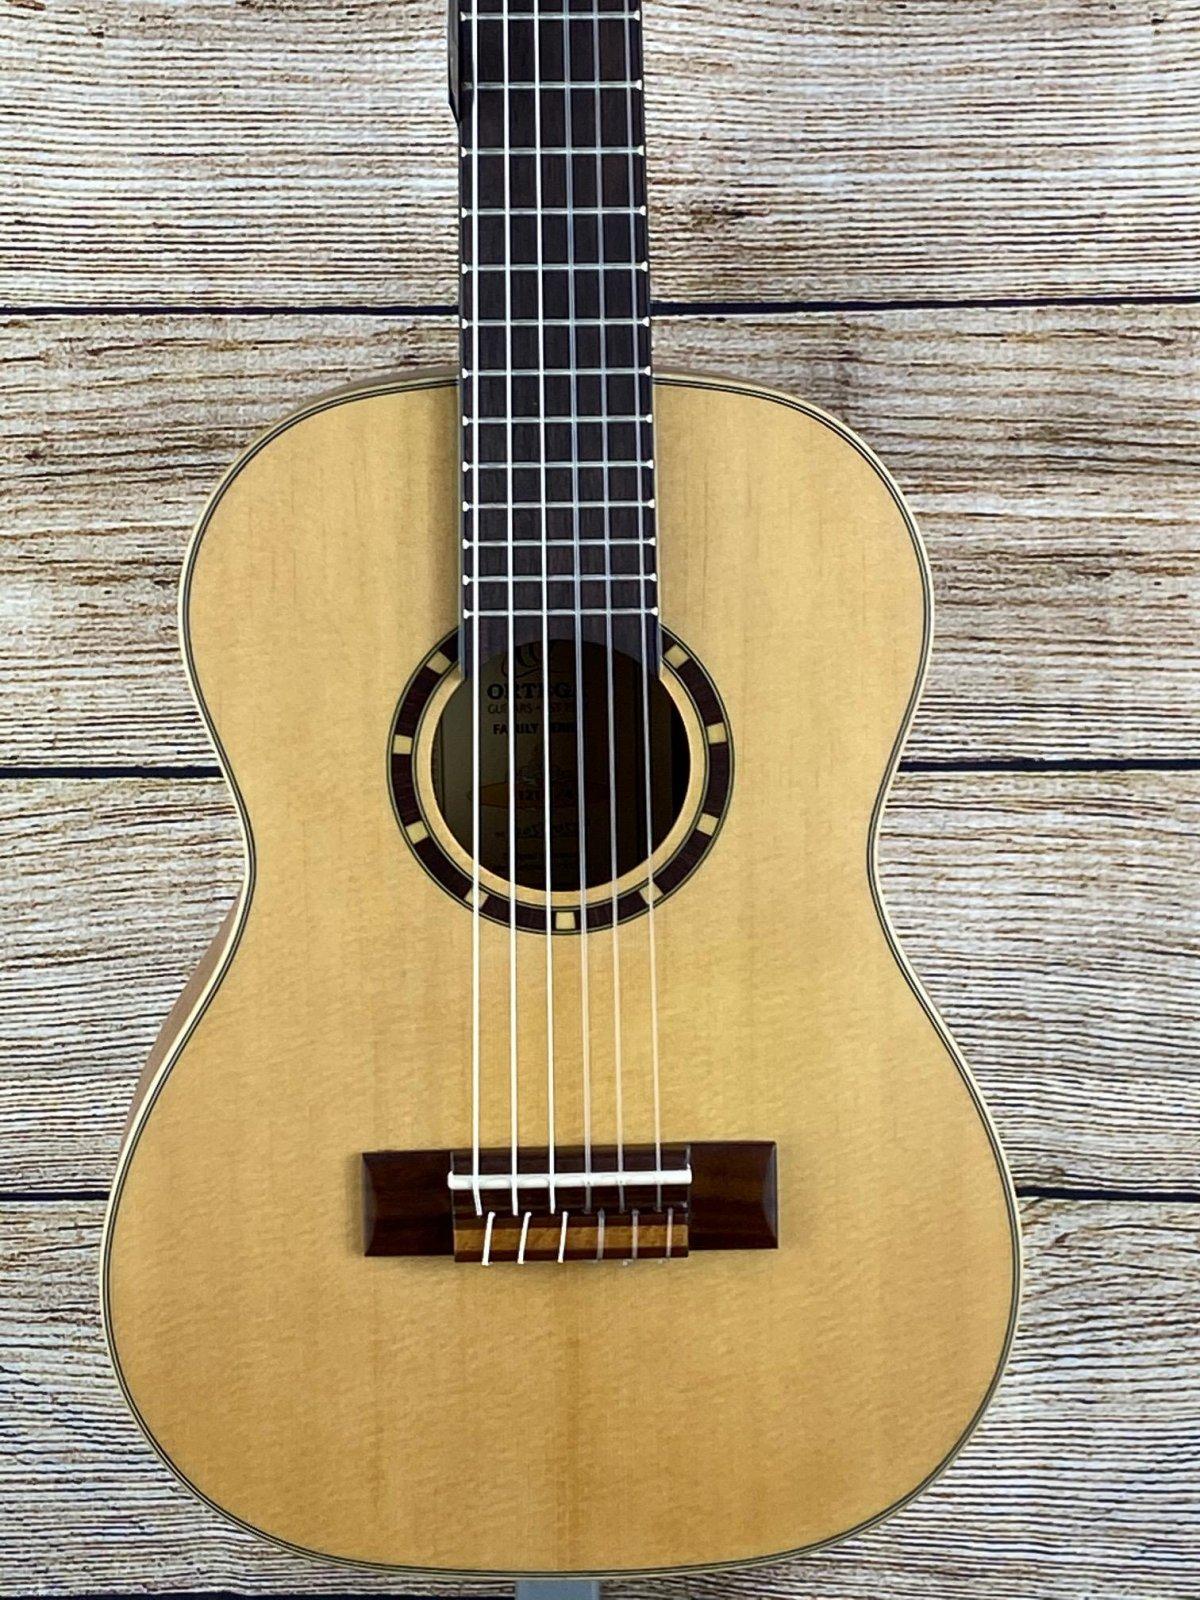 Ortega Family Series R121-1/4 1/4 Size Classical Guitar Satin Natural